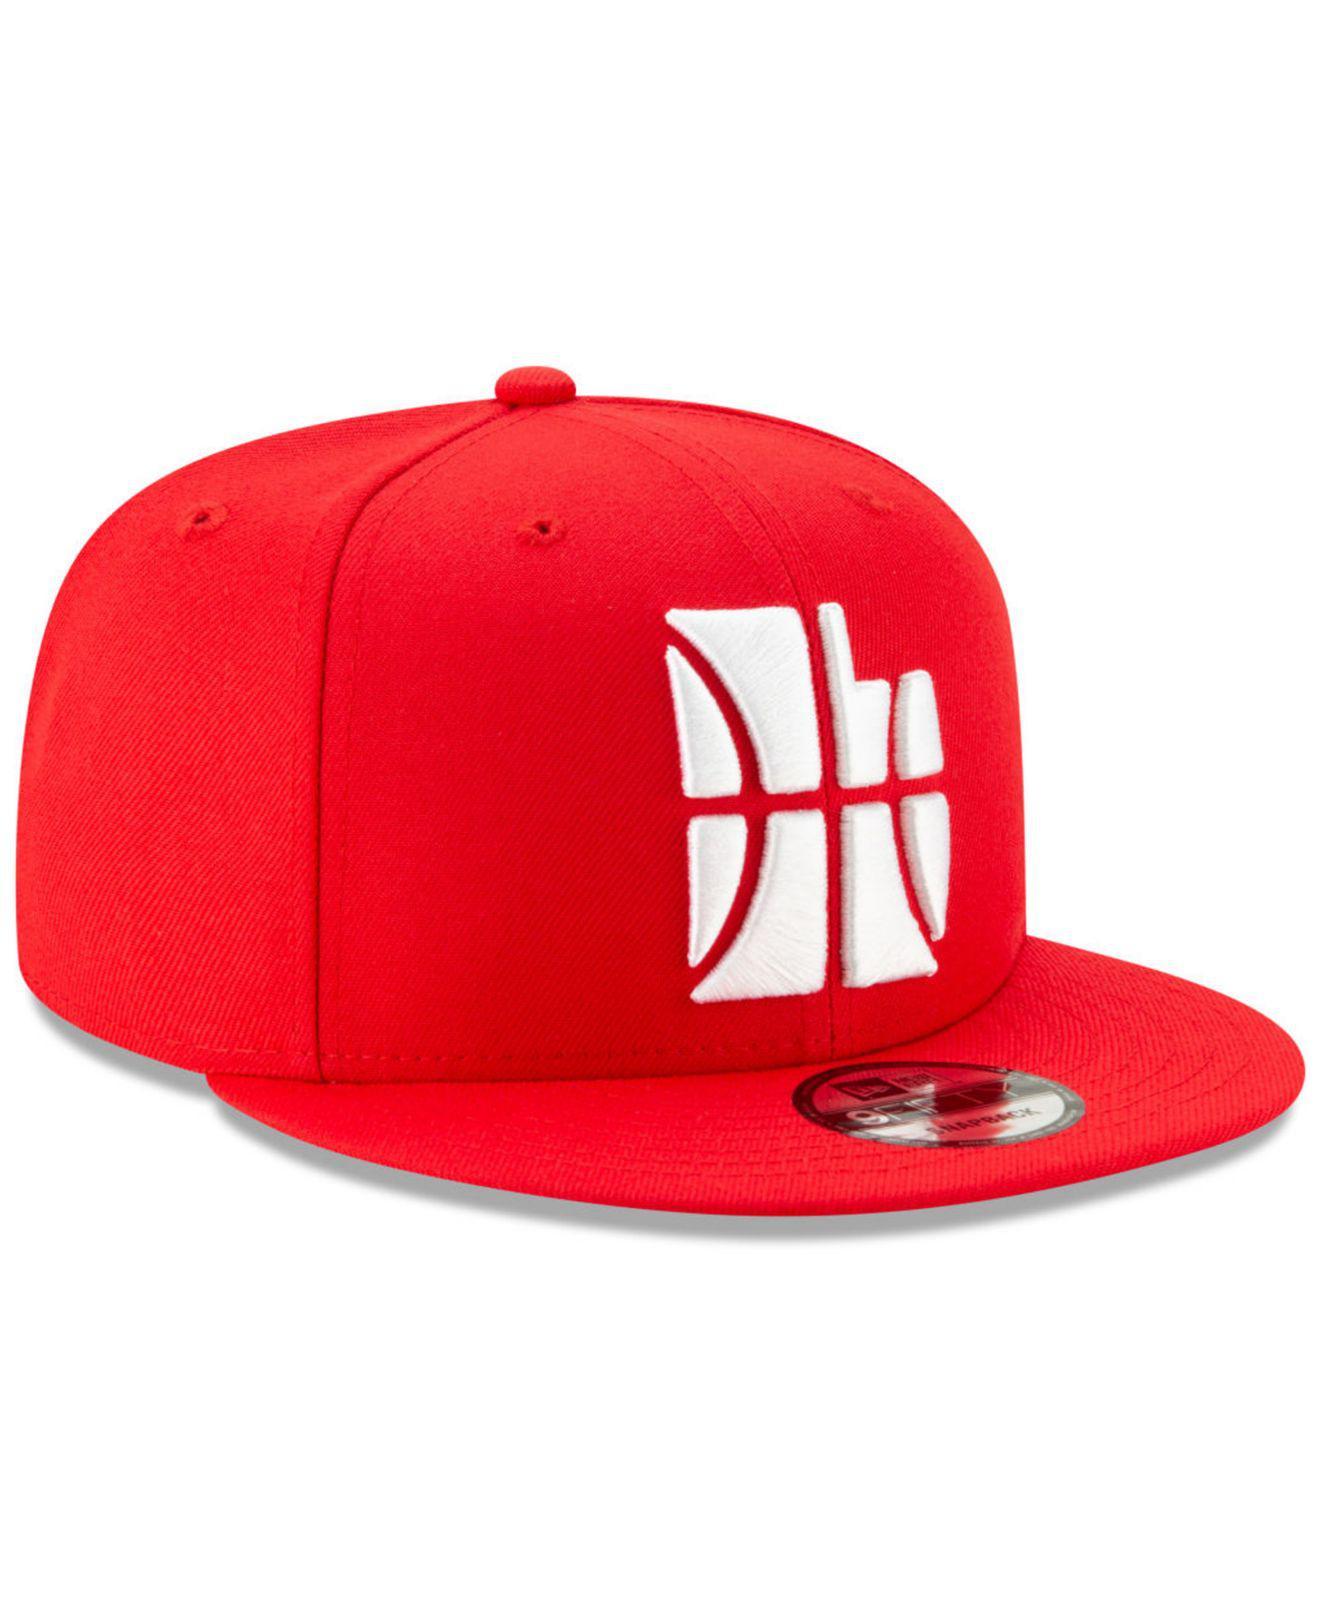 the best attitude 2b327 59bb9 KTZ Utah Jazz City Series 2.0 9fifty Snapback Cap in Red for Men - Lyst